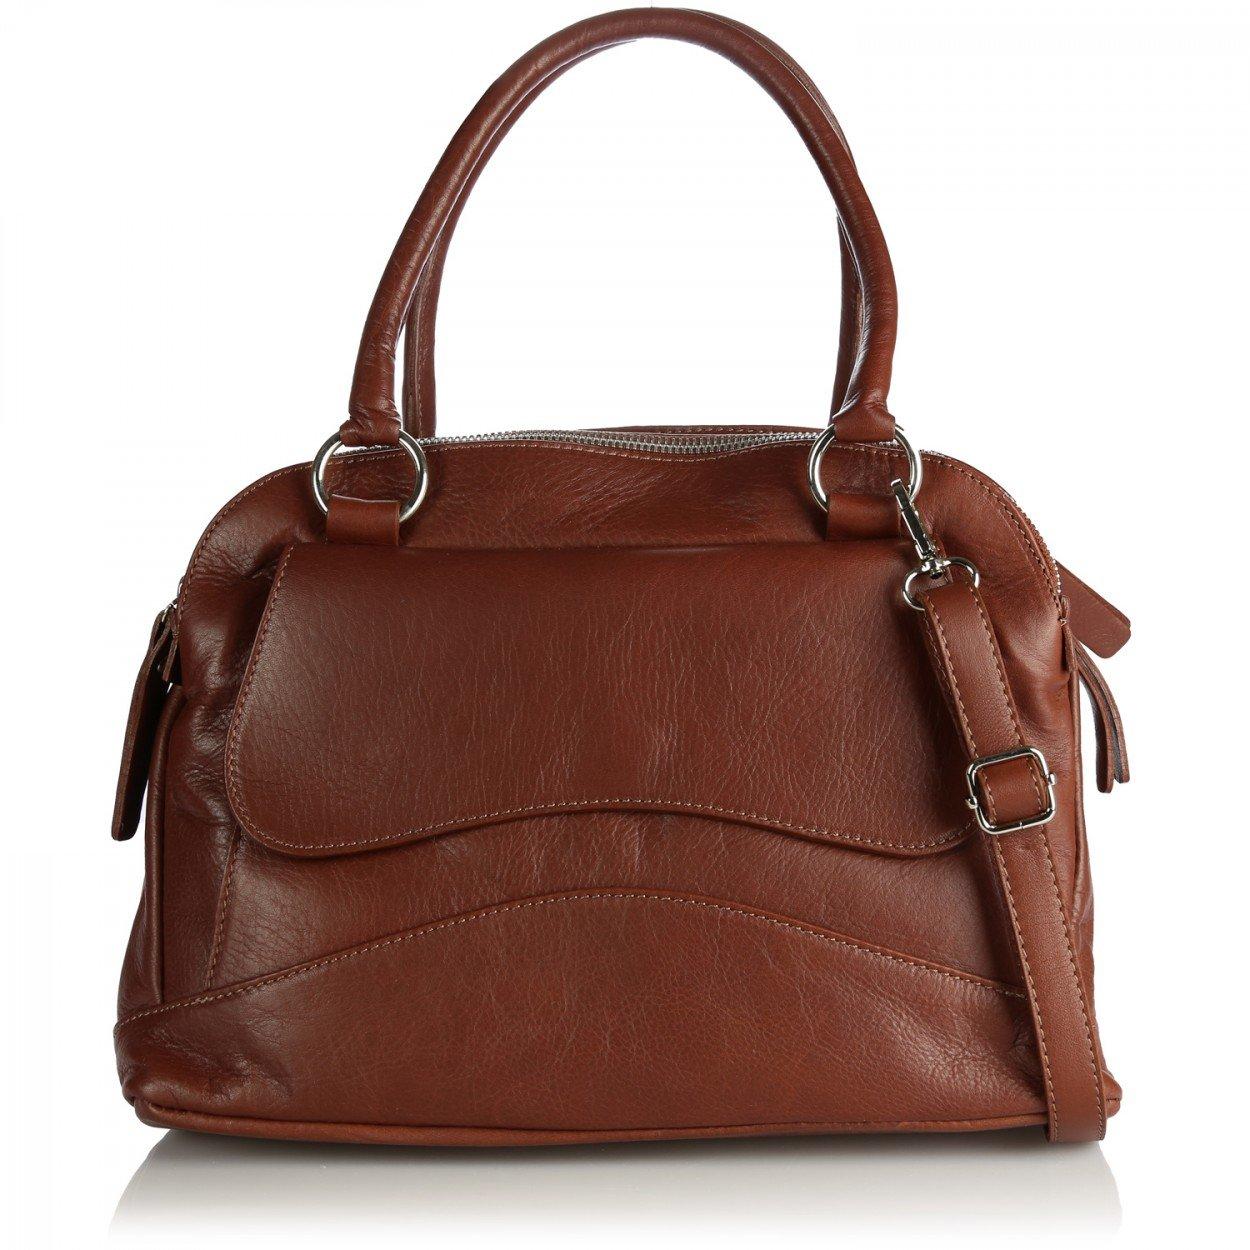 Olivia - Sac à main femme Cuir De Vachette'SUZI' + Organiseur de sac à main - Marron, Cuir 1143+OR